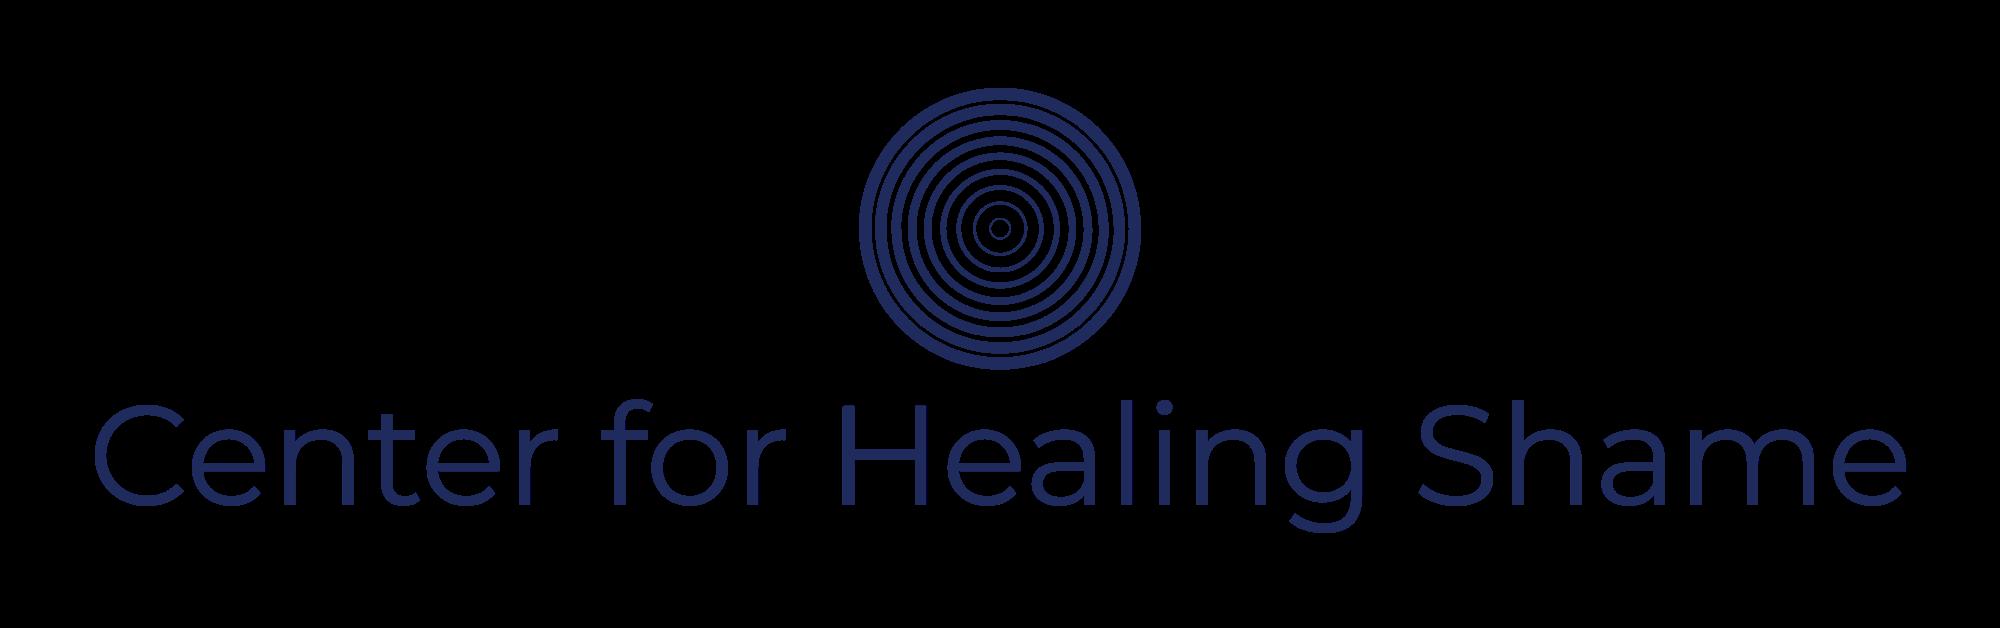 Center for Healing Shame-logo (3).png